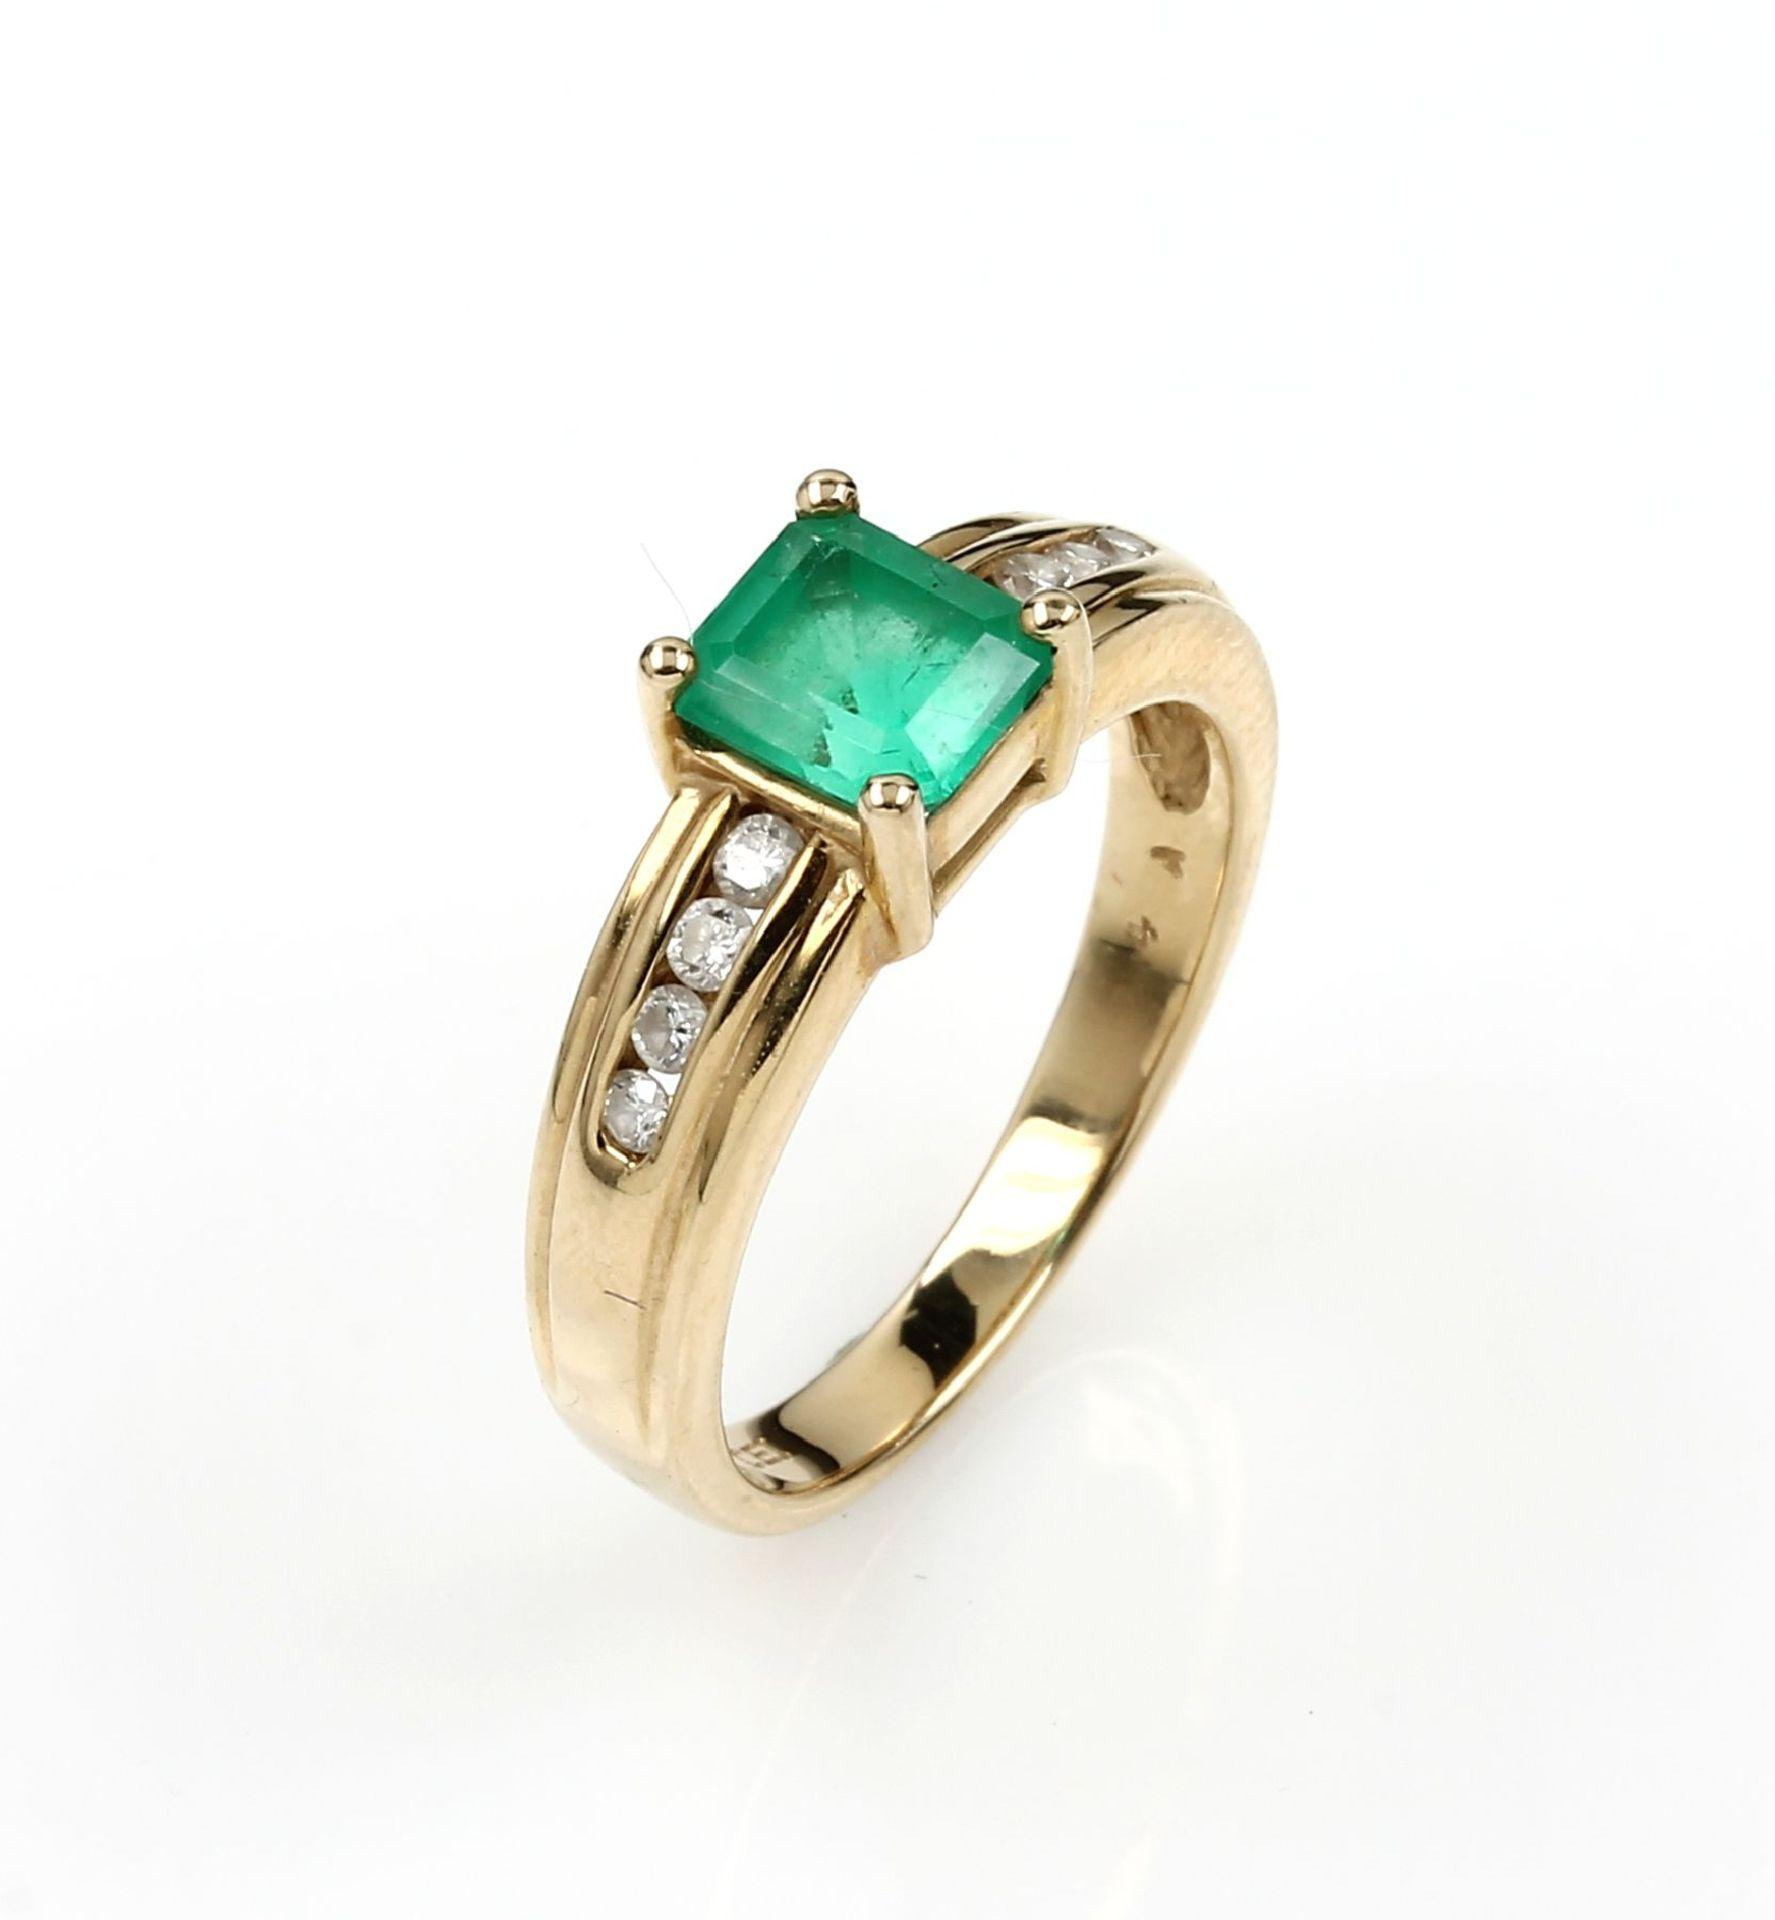 14 kt Gold Ring mit Smaragd und Brillanten, GG 585/000, mittig rechteckig facett. Smaragd ca. 0.70